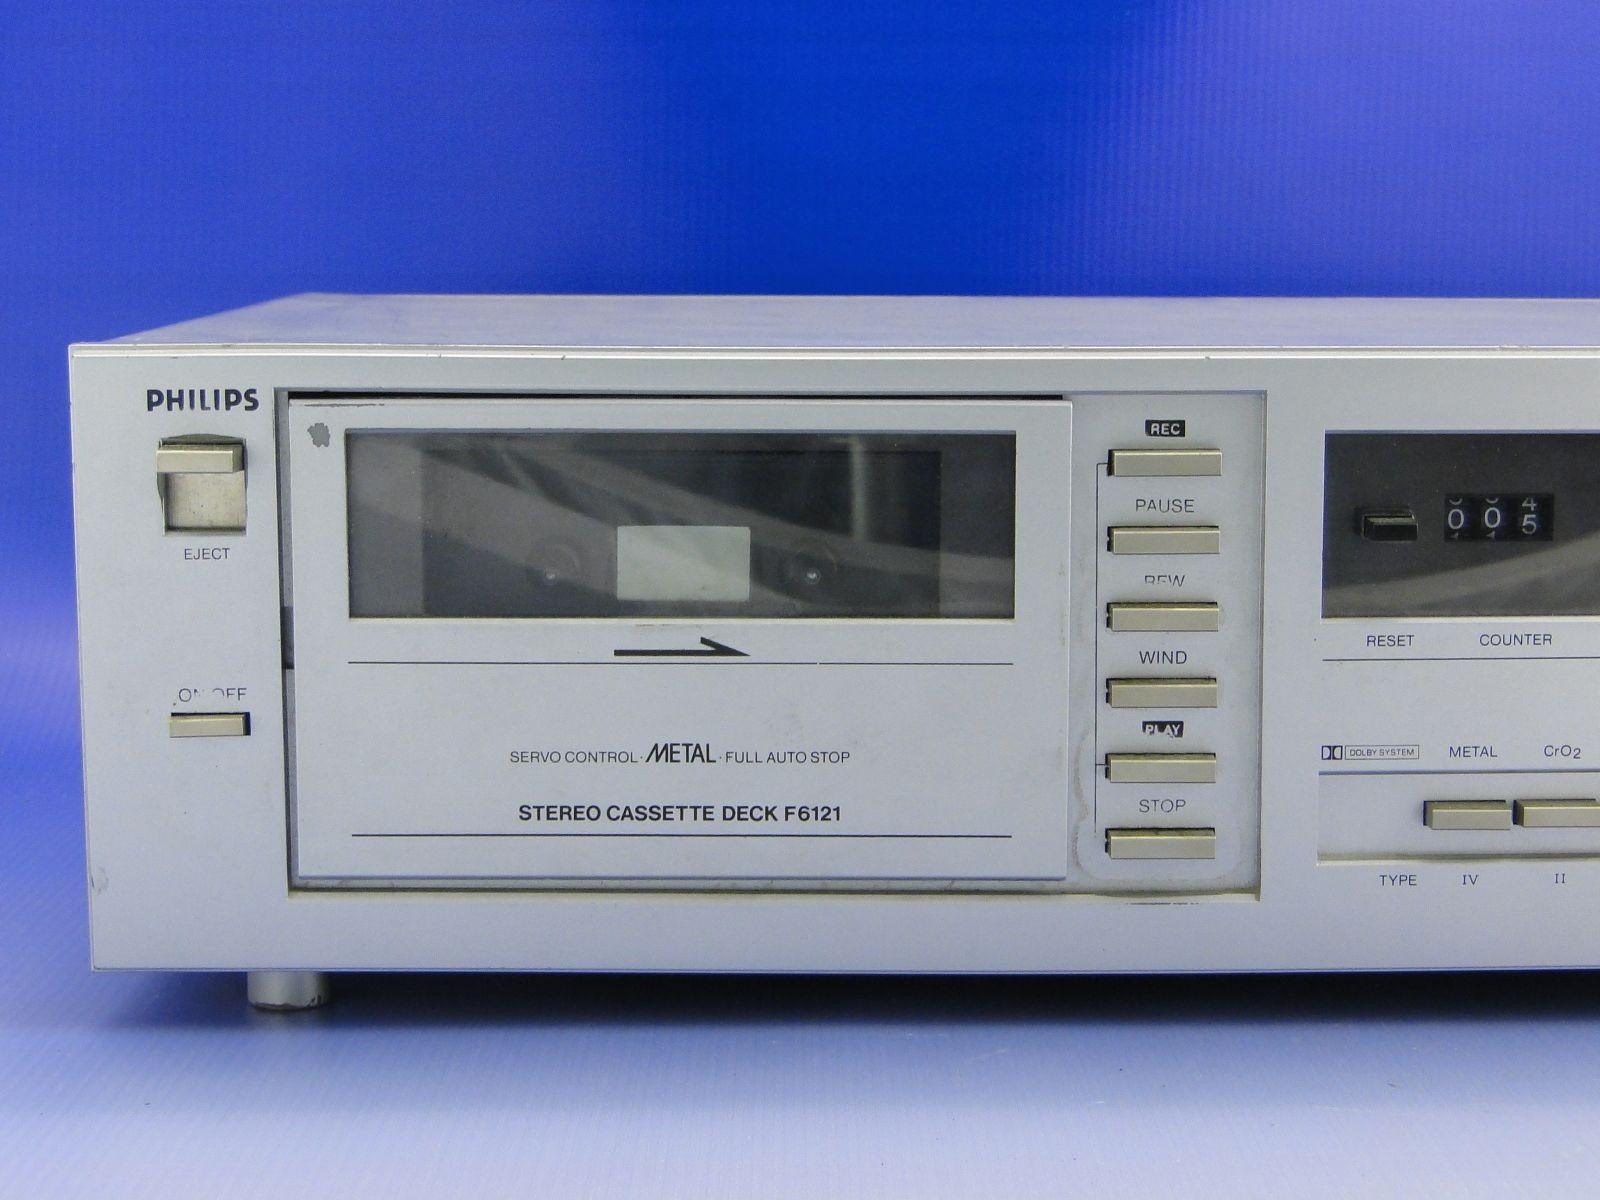 DSC00640.JPG (1600×1200)